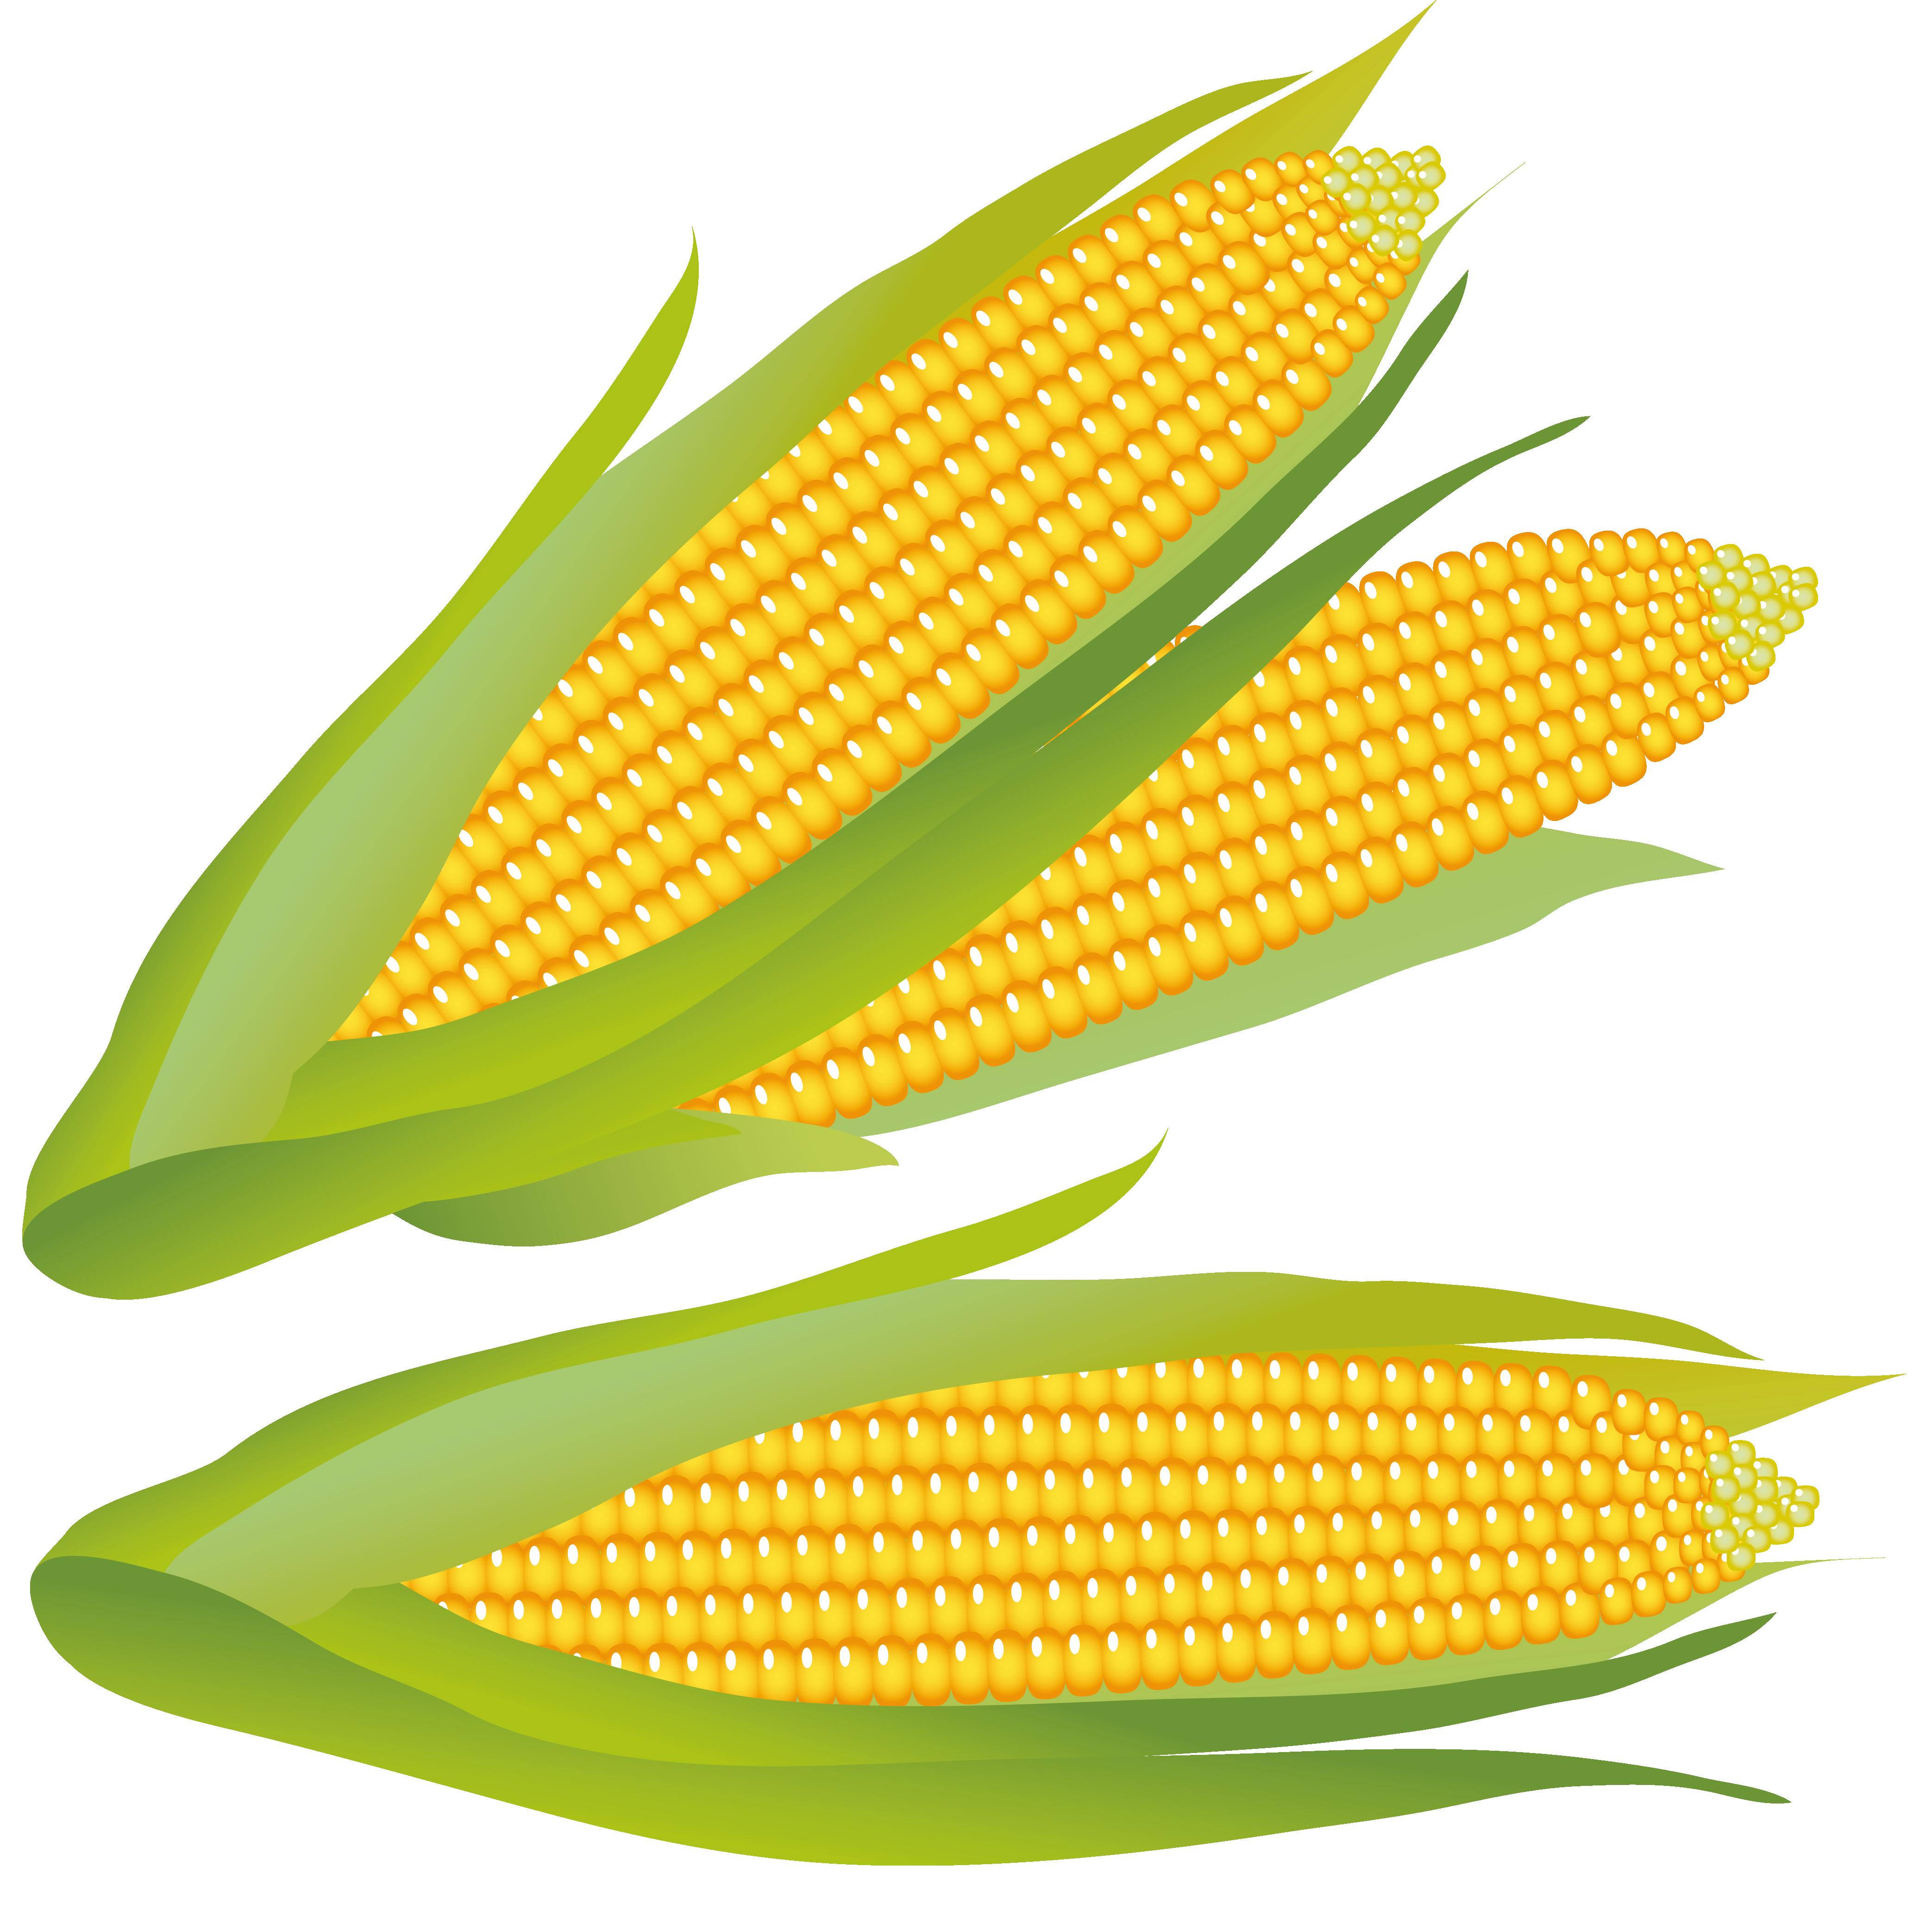 Free Corn Cliparts, Download Free Clip Art, Free Clip Art on.